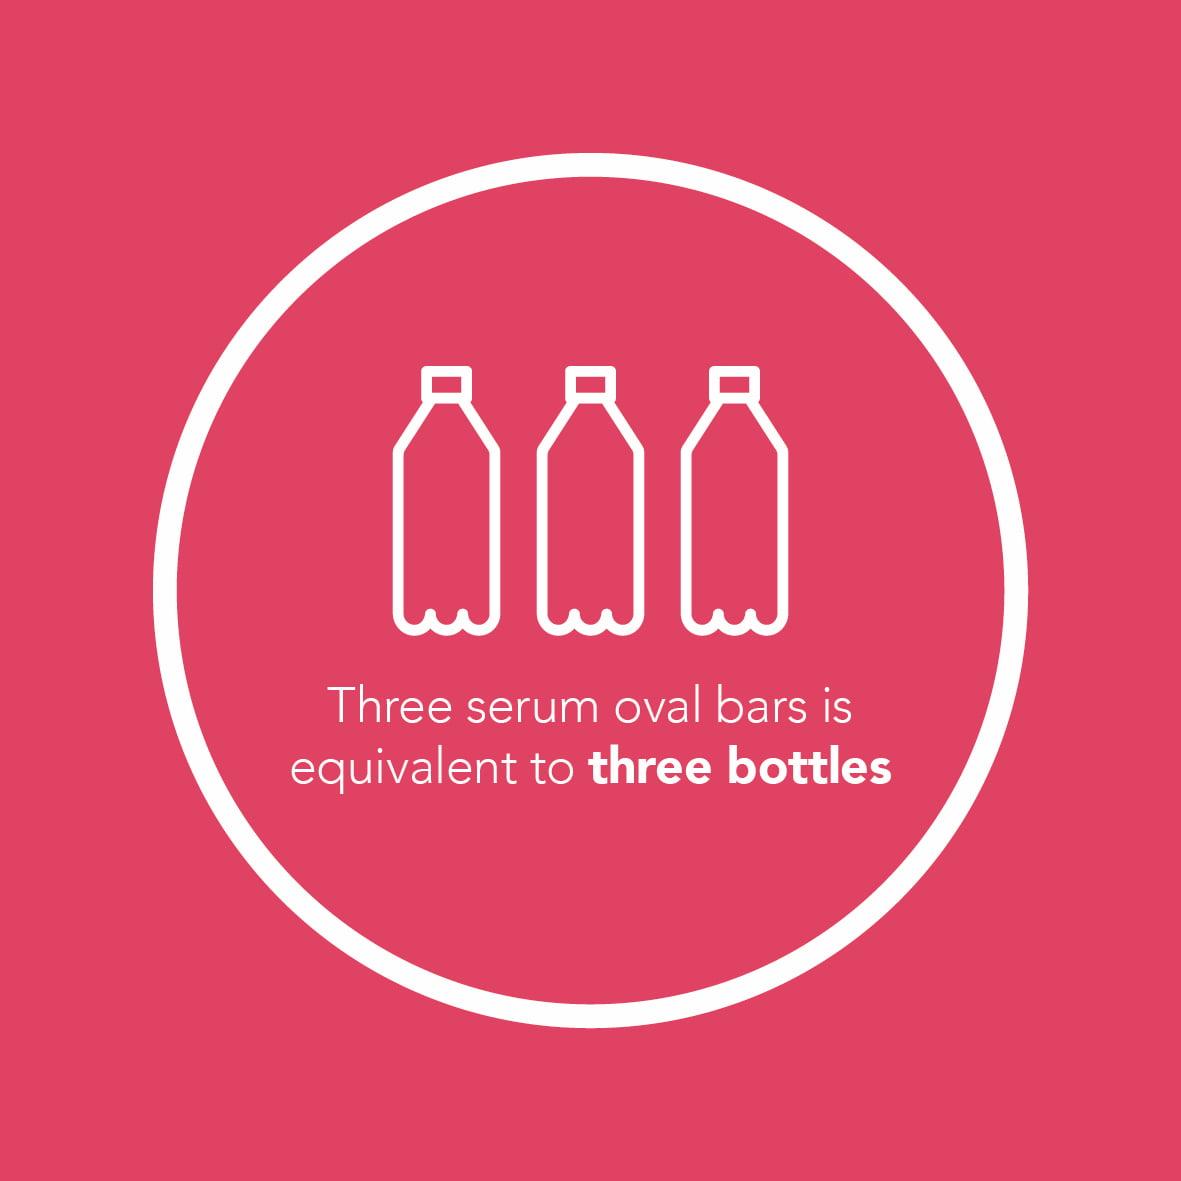 3 Pack - Ethique Eco-Friendly, Saving Face Serum 2.472 oz Dermalogica - Skin Prep Scrub - 75ml/2.5oz